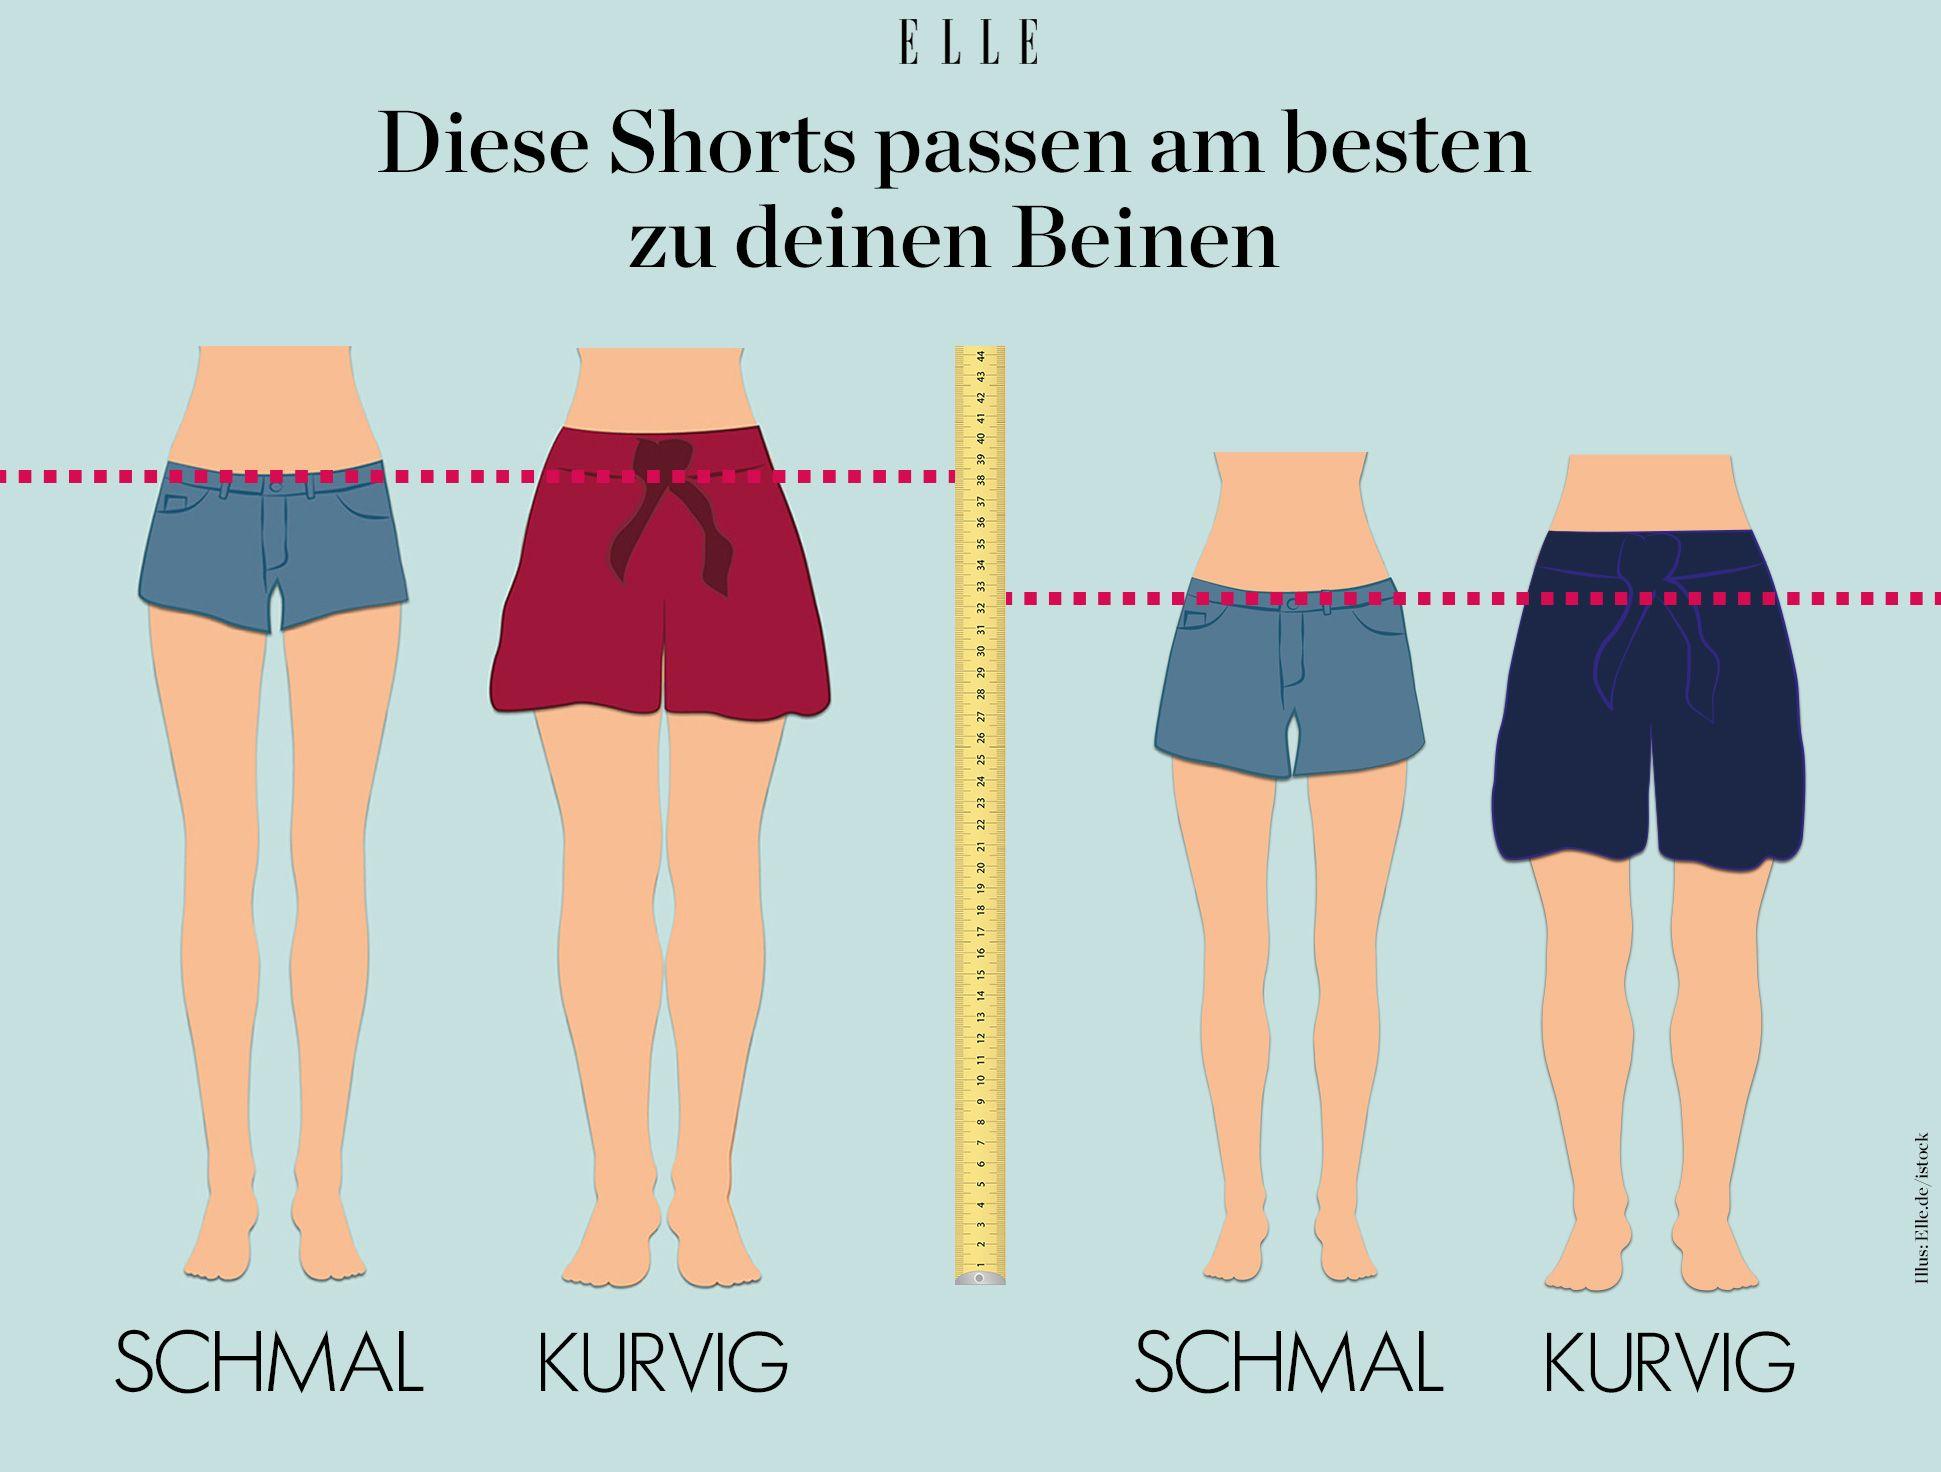 Kurze Dickes Shorts Mädchen Mädchen